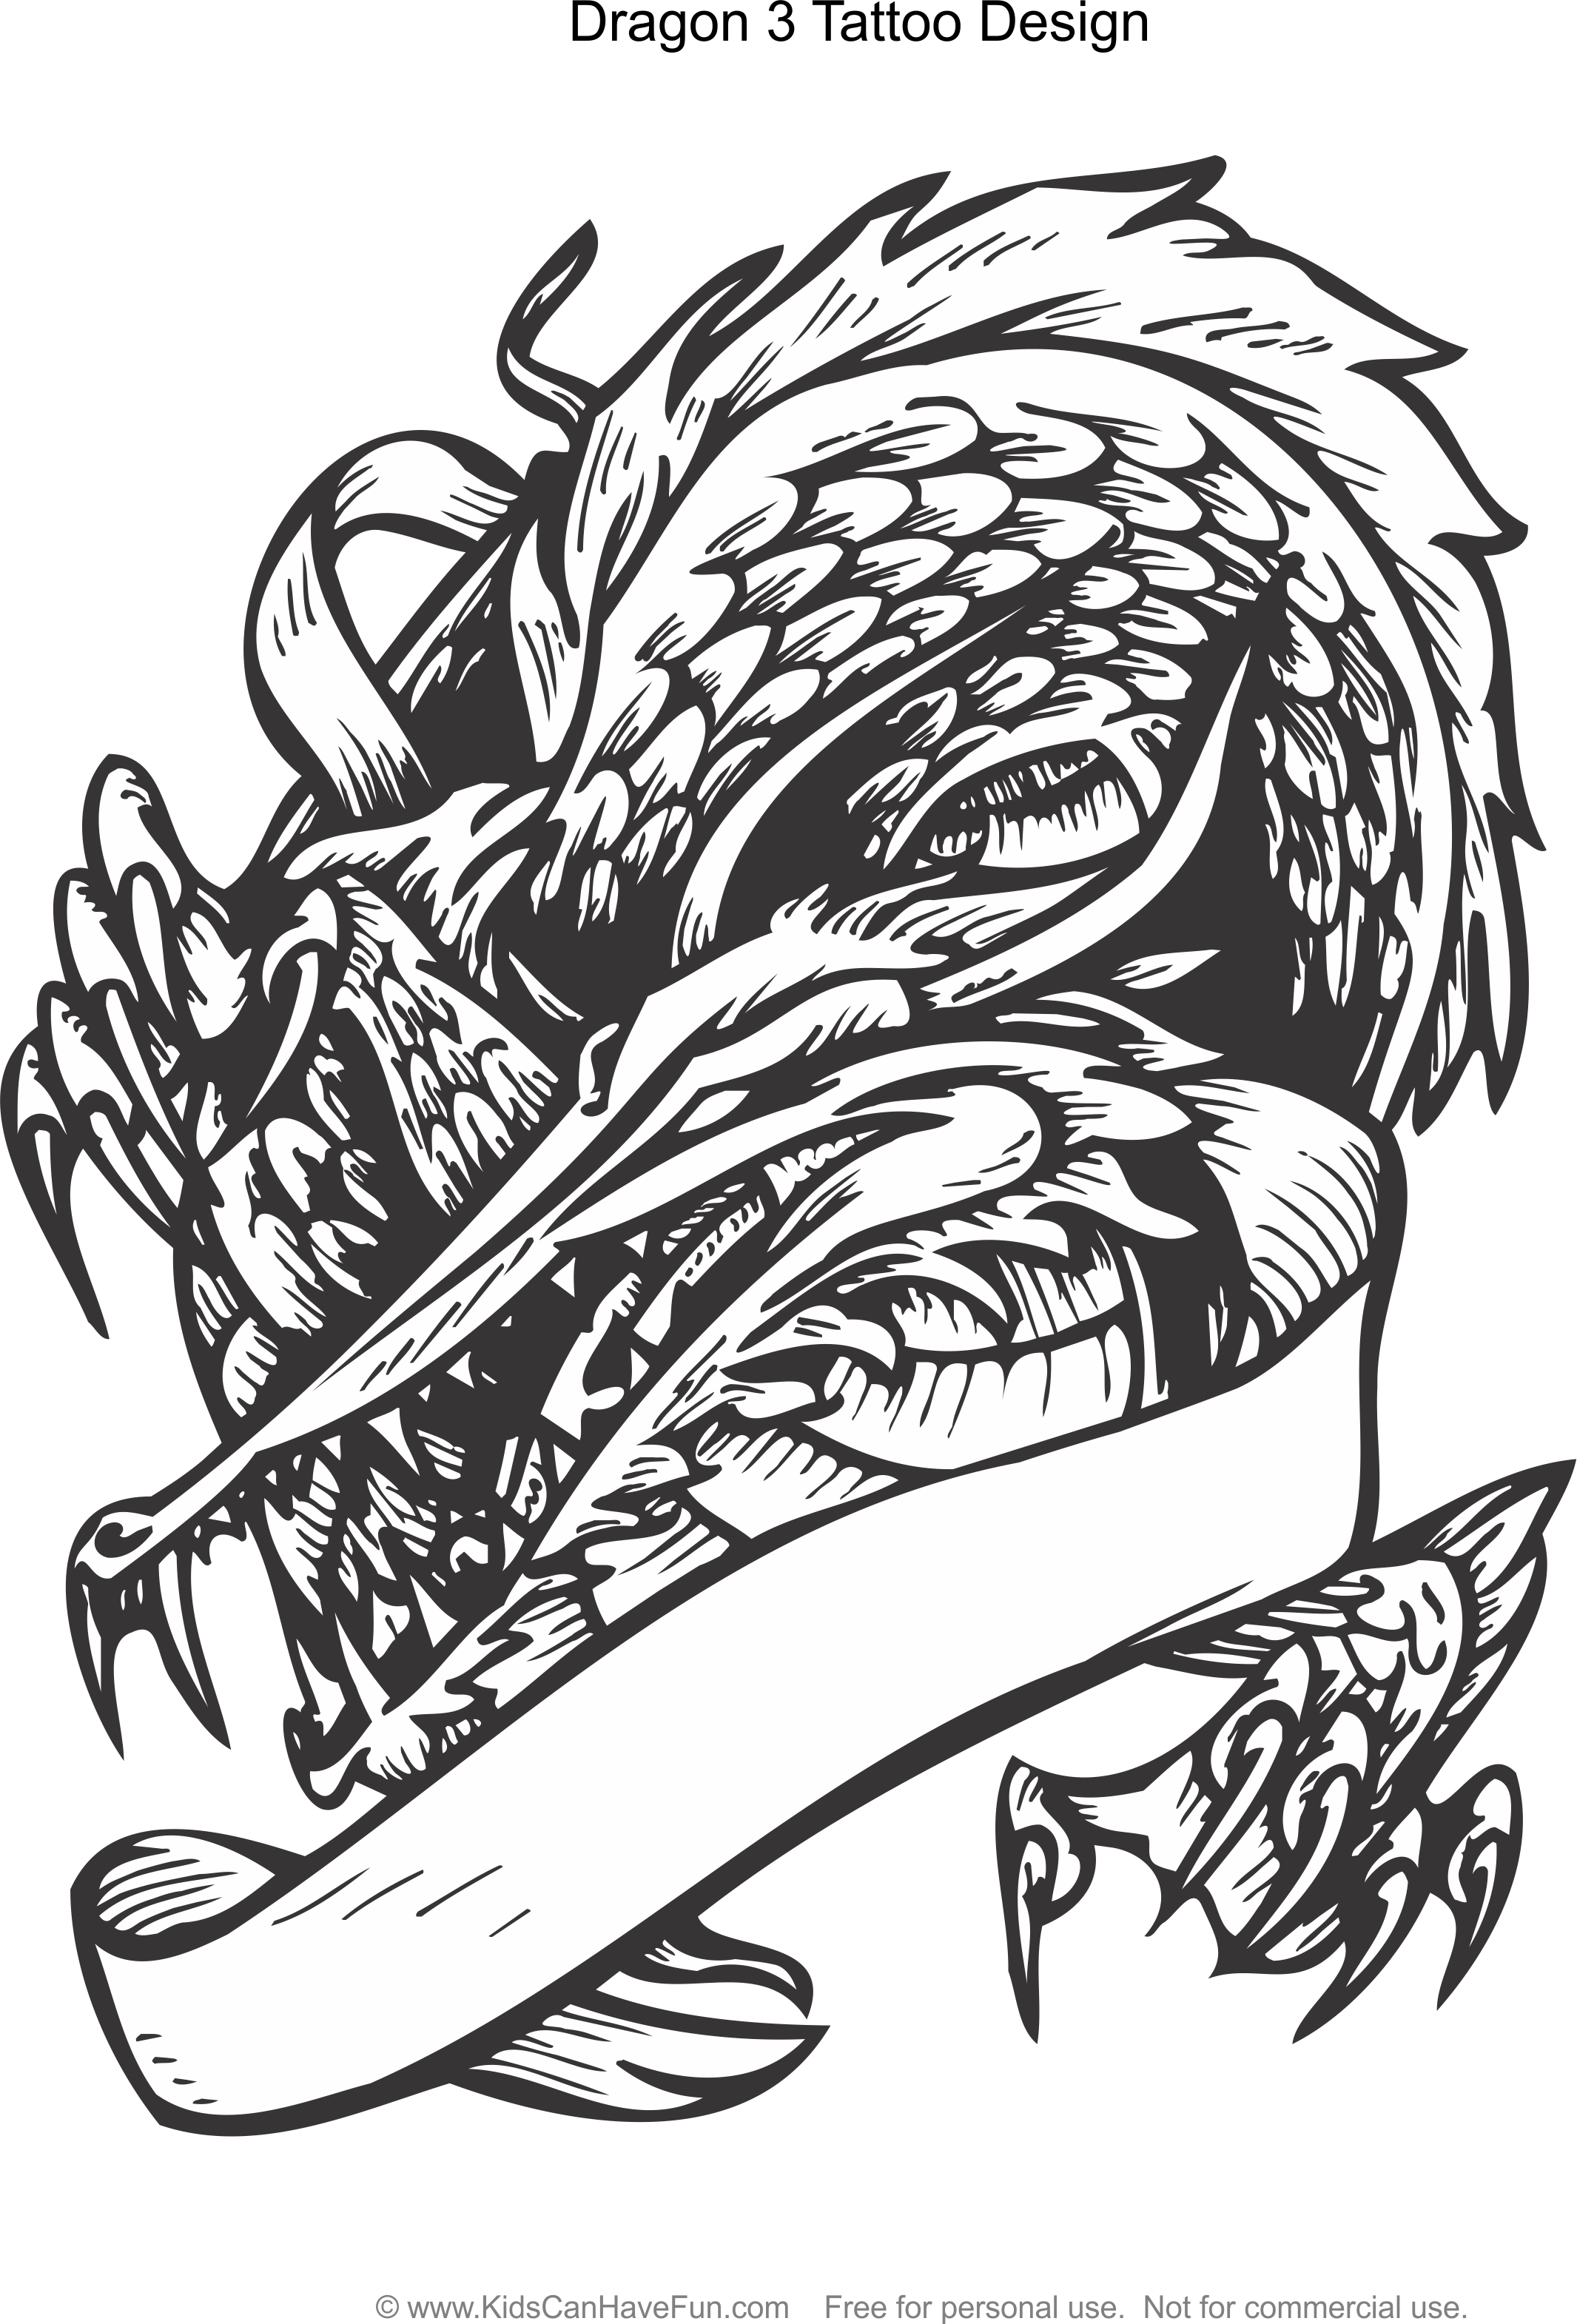 Dragon 3 Tattoo Design coloring page http://www.kidscanhavefun.com ...